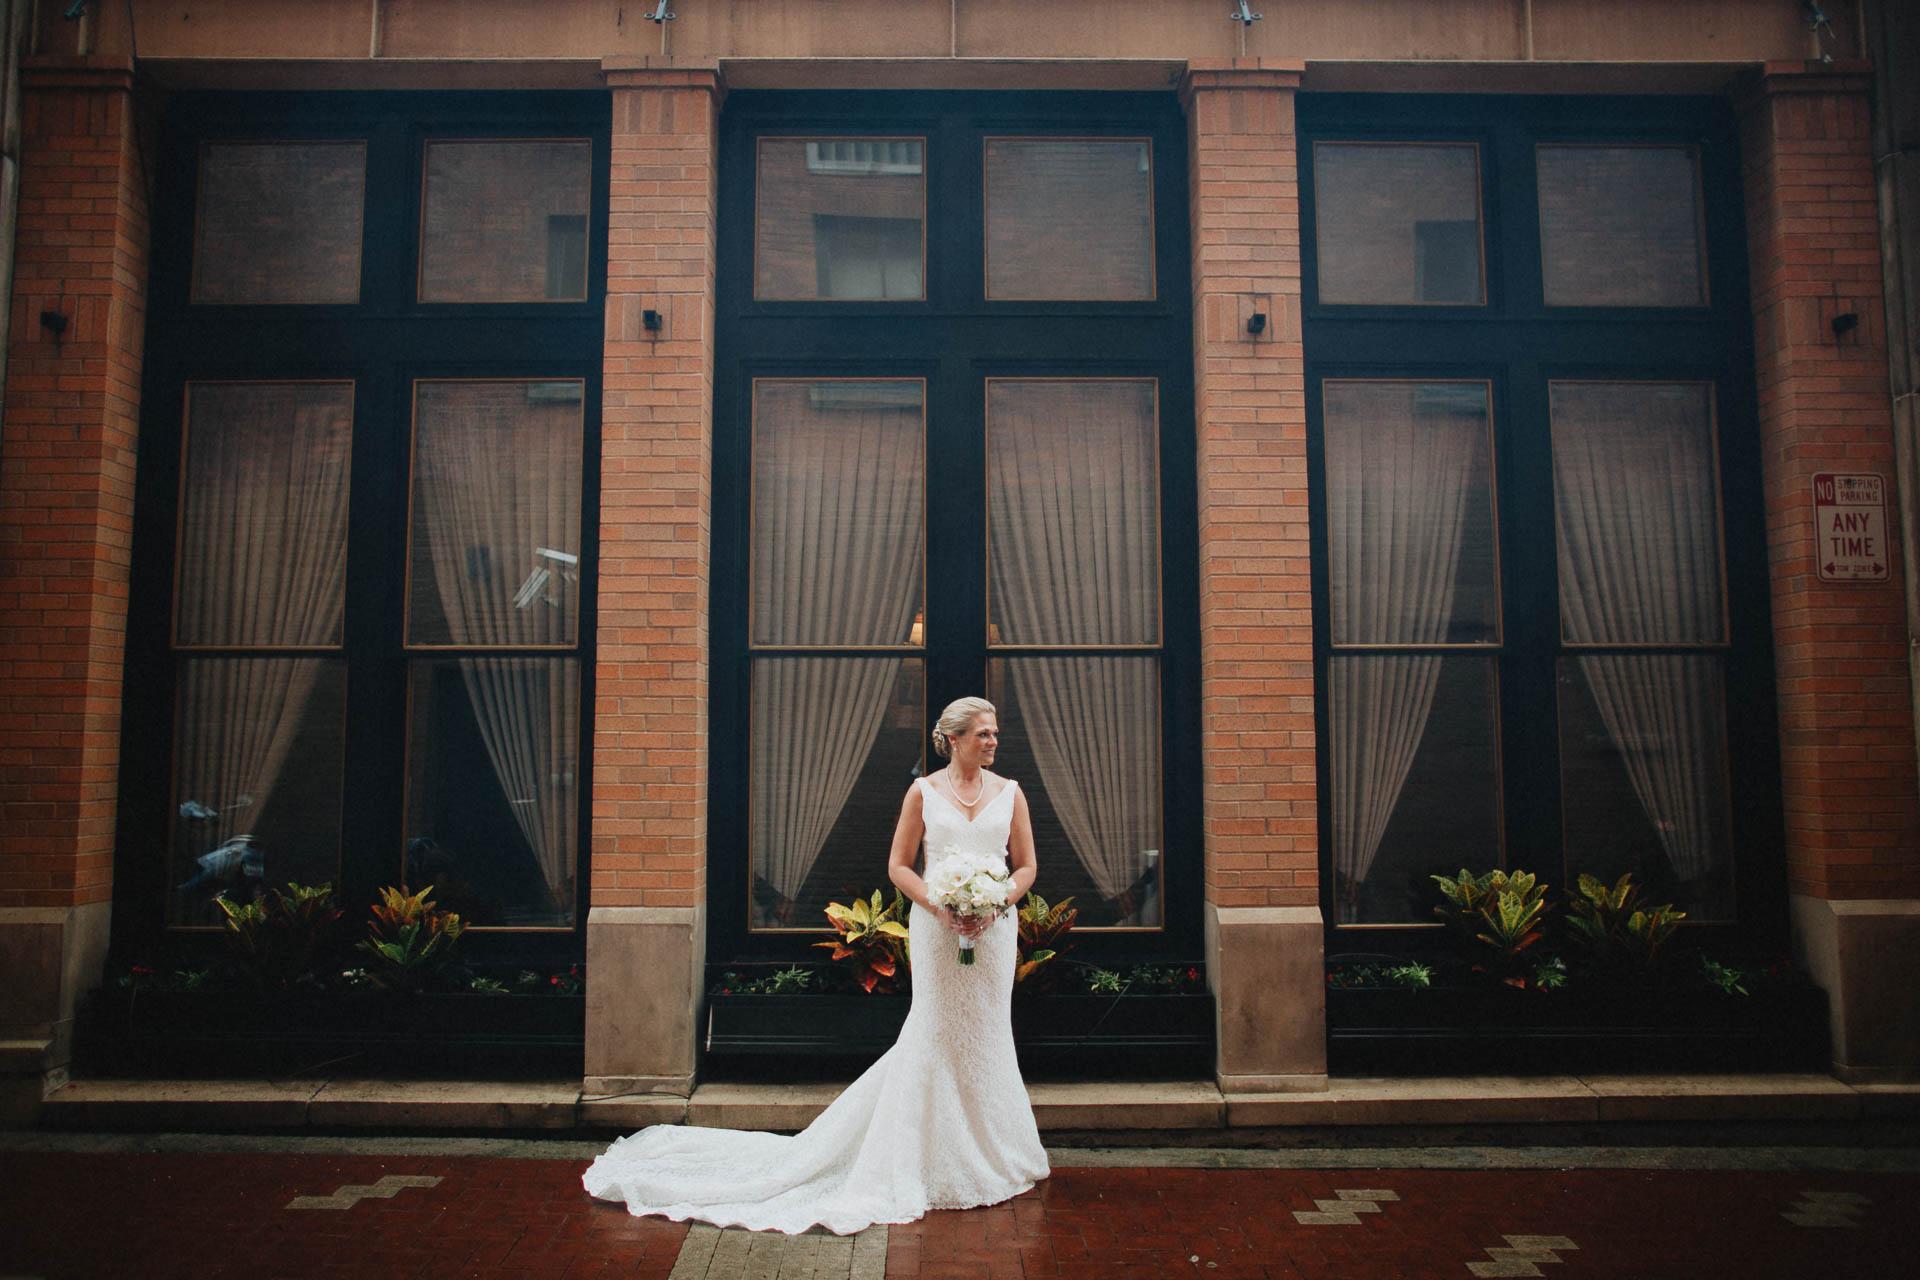 Cincinnati-Contemporary-Arts-Center-Wedding-036.jpg